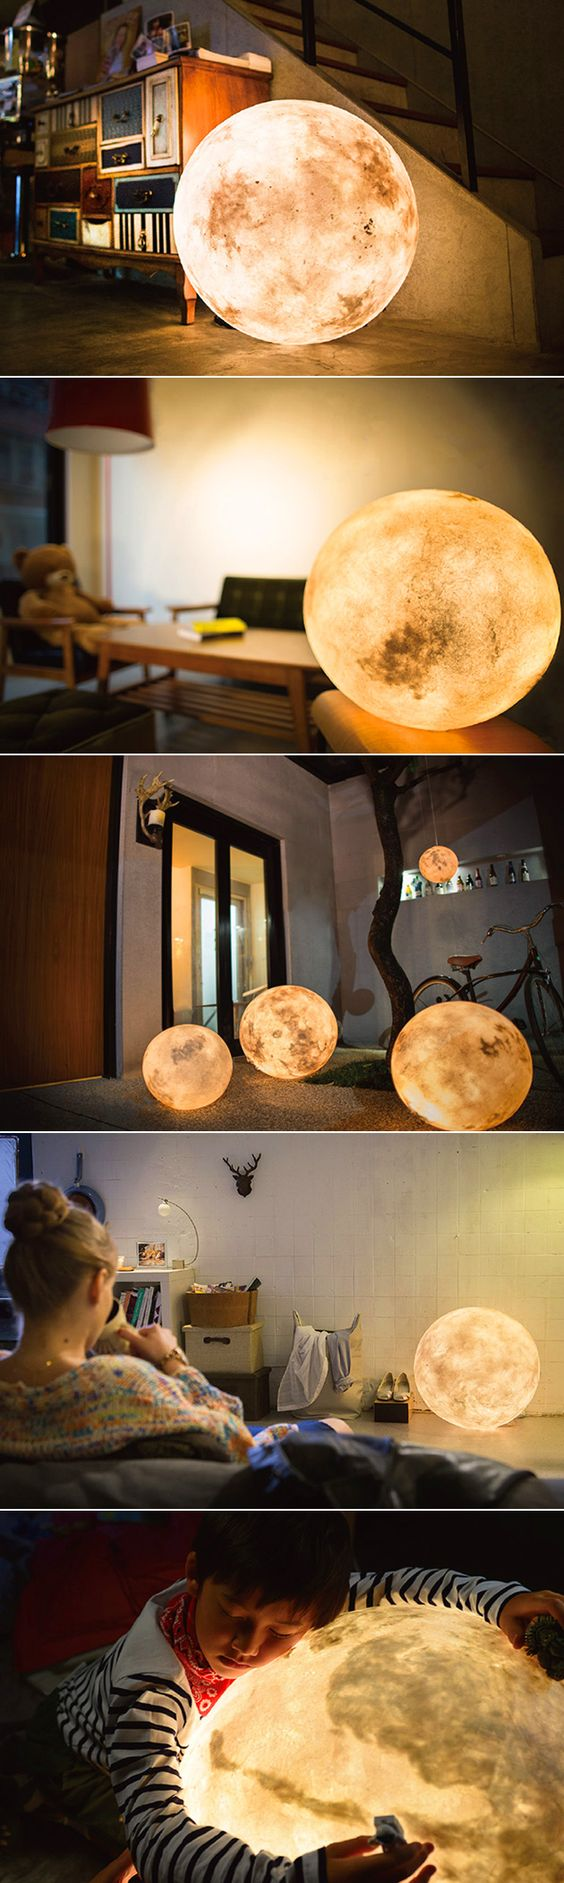 Light/Lamp that looks like the moon